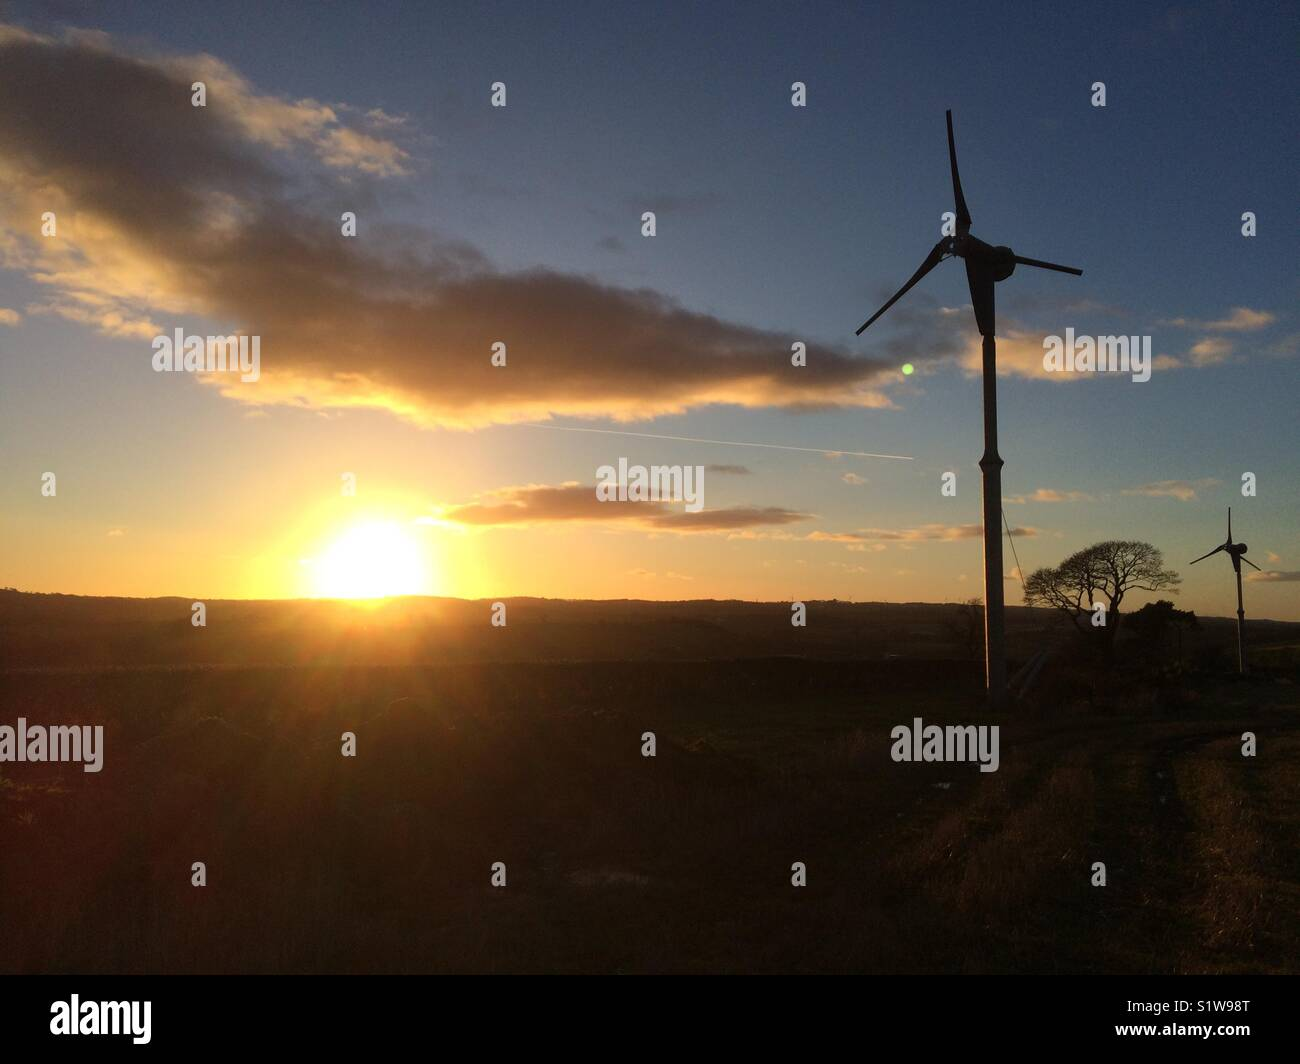 Sunset and turbines - Stock Image